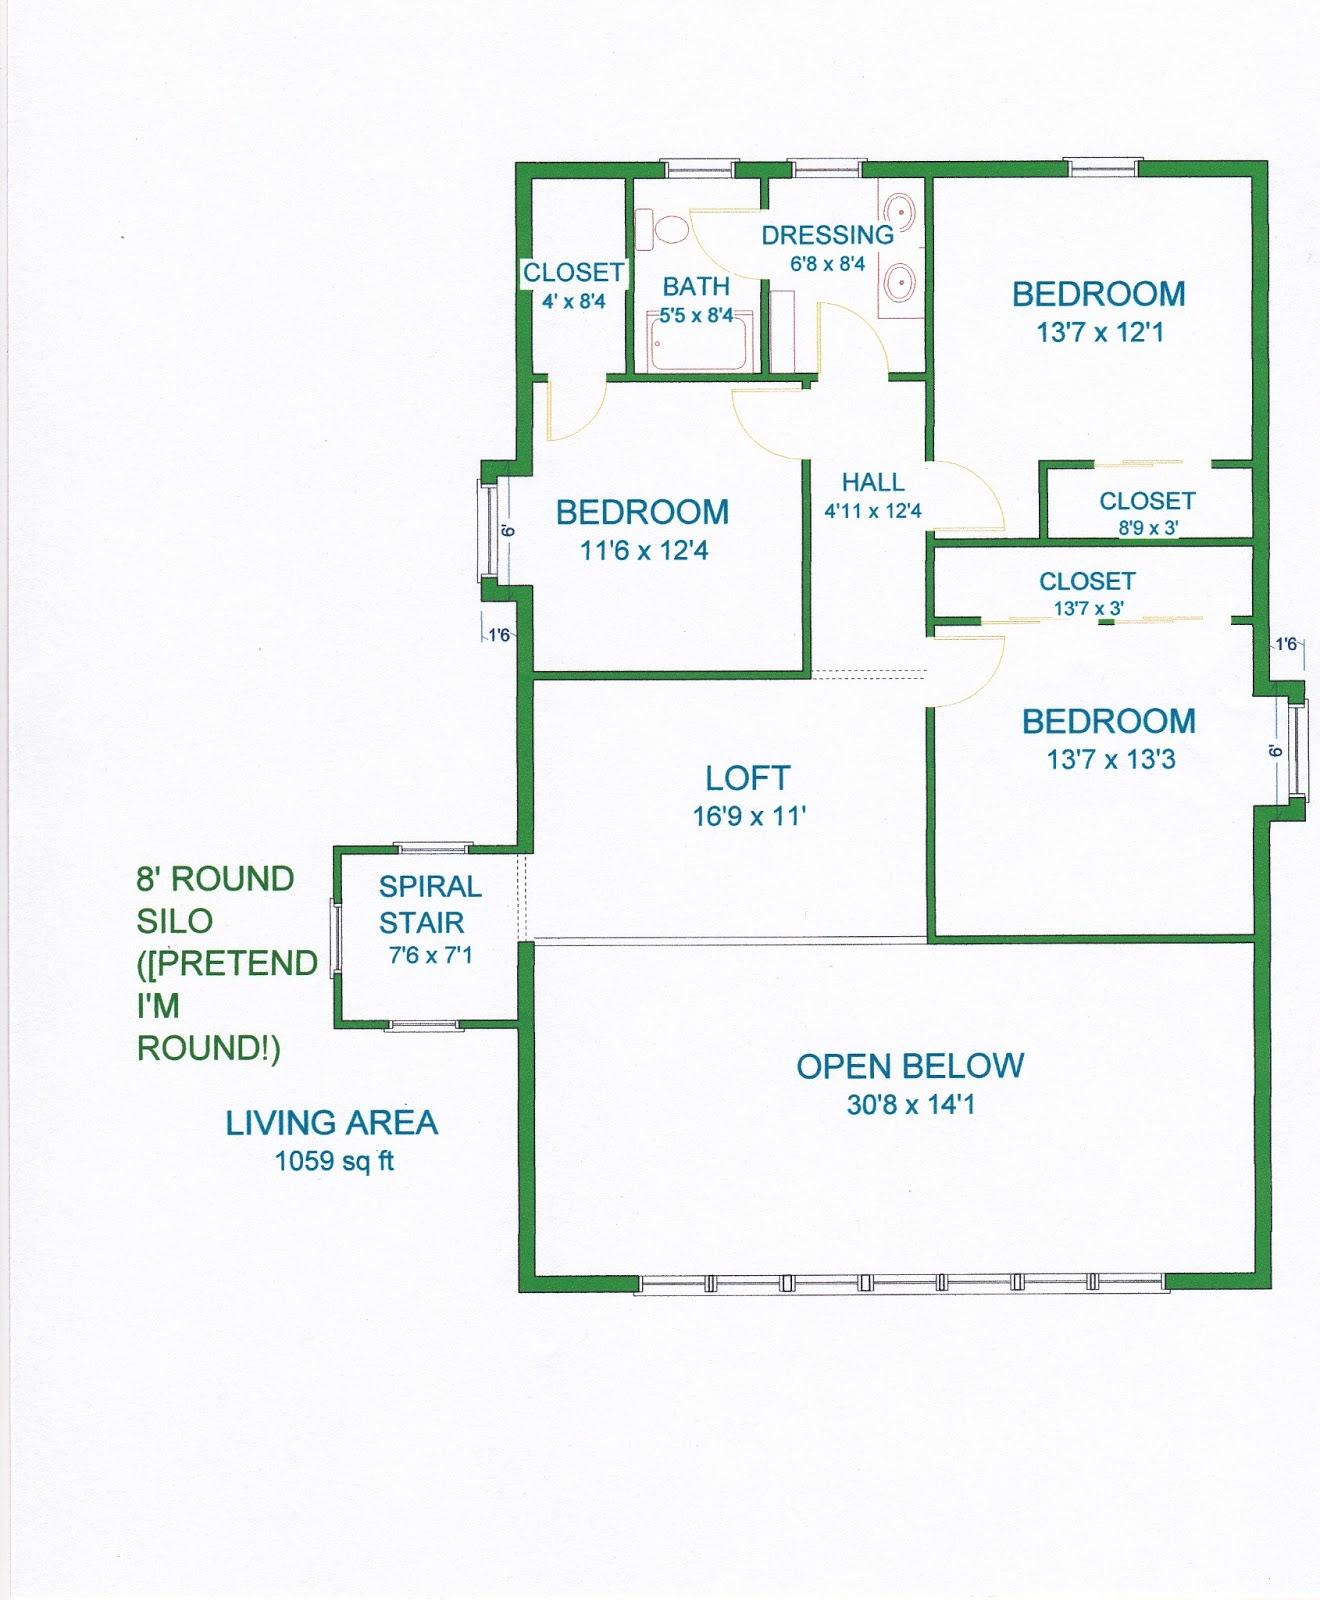 Gambrel style house floor plans house design plans for Gambrel floor plans